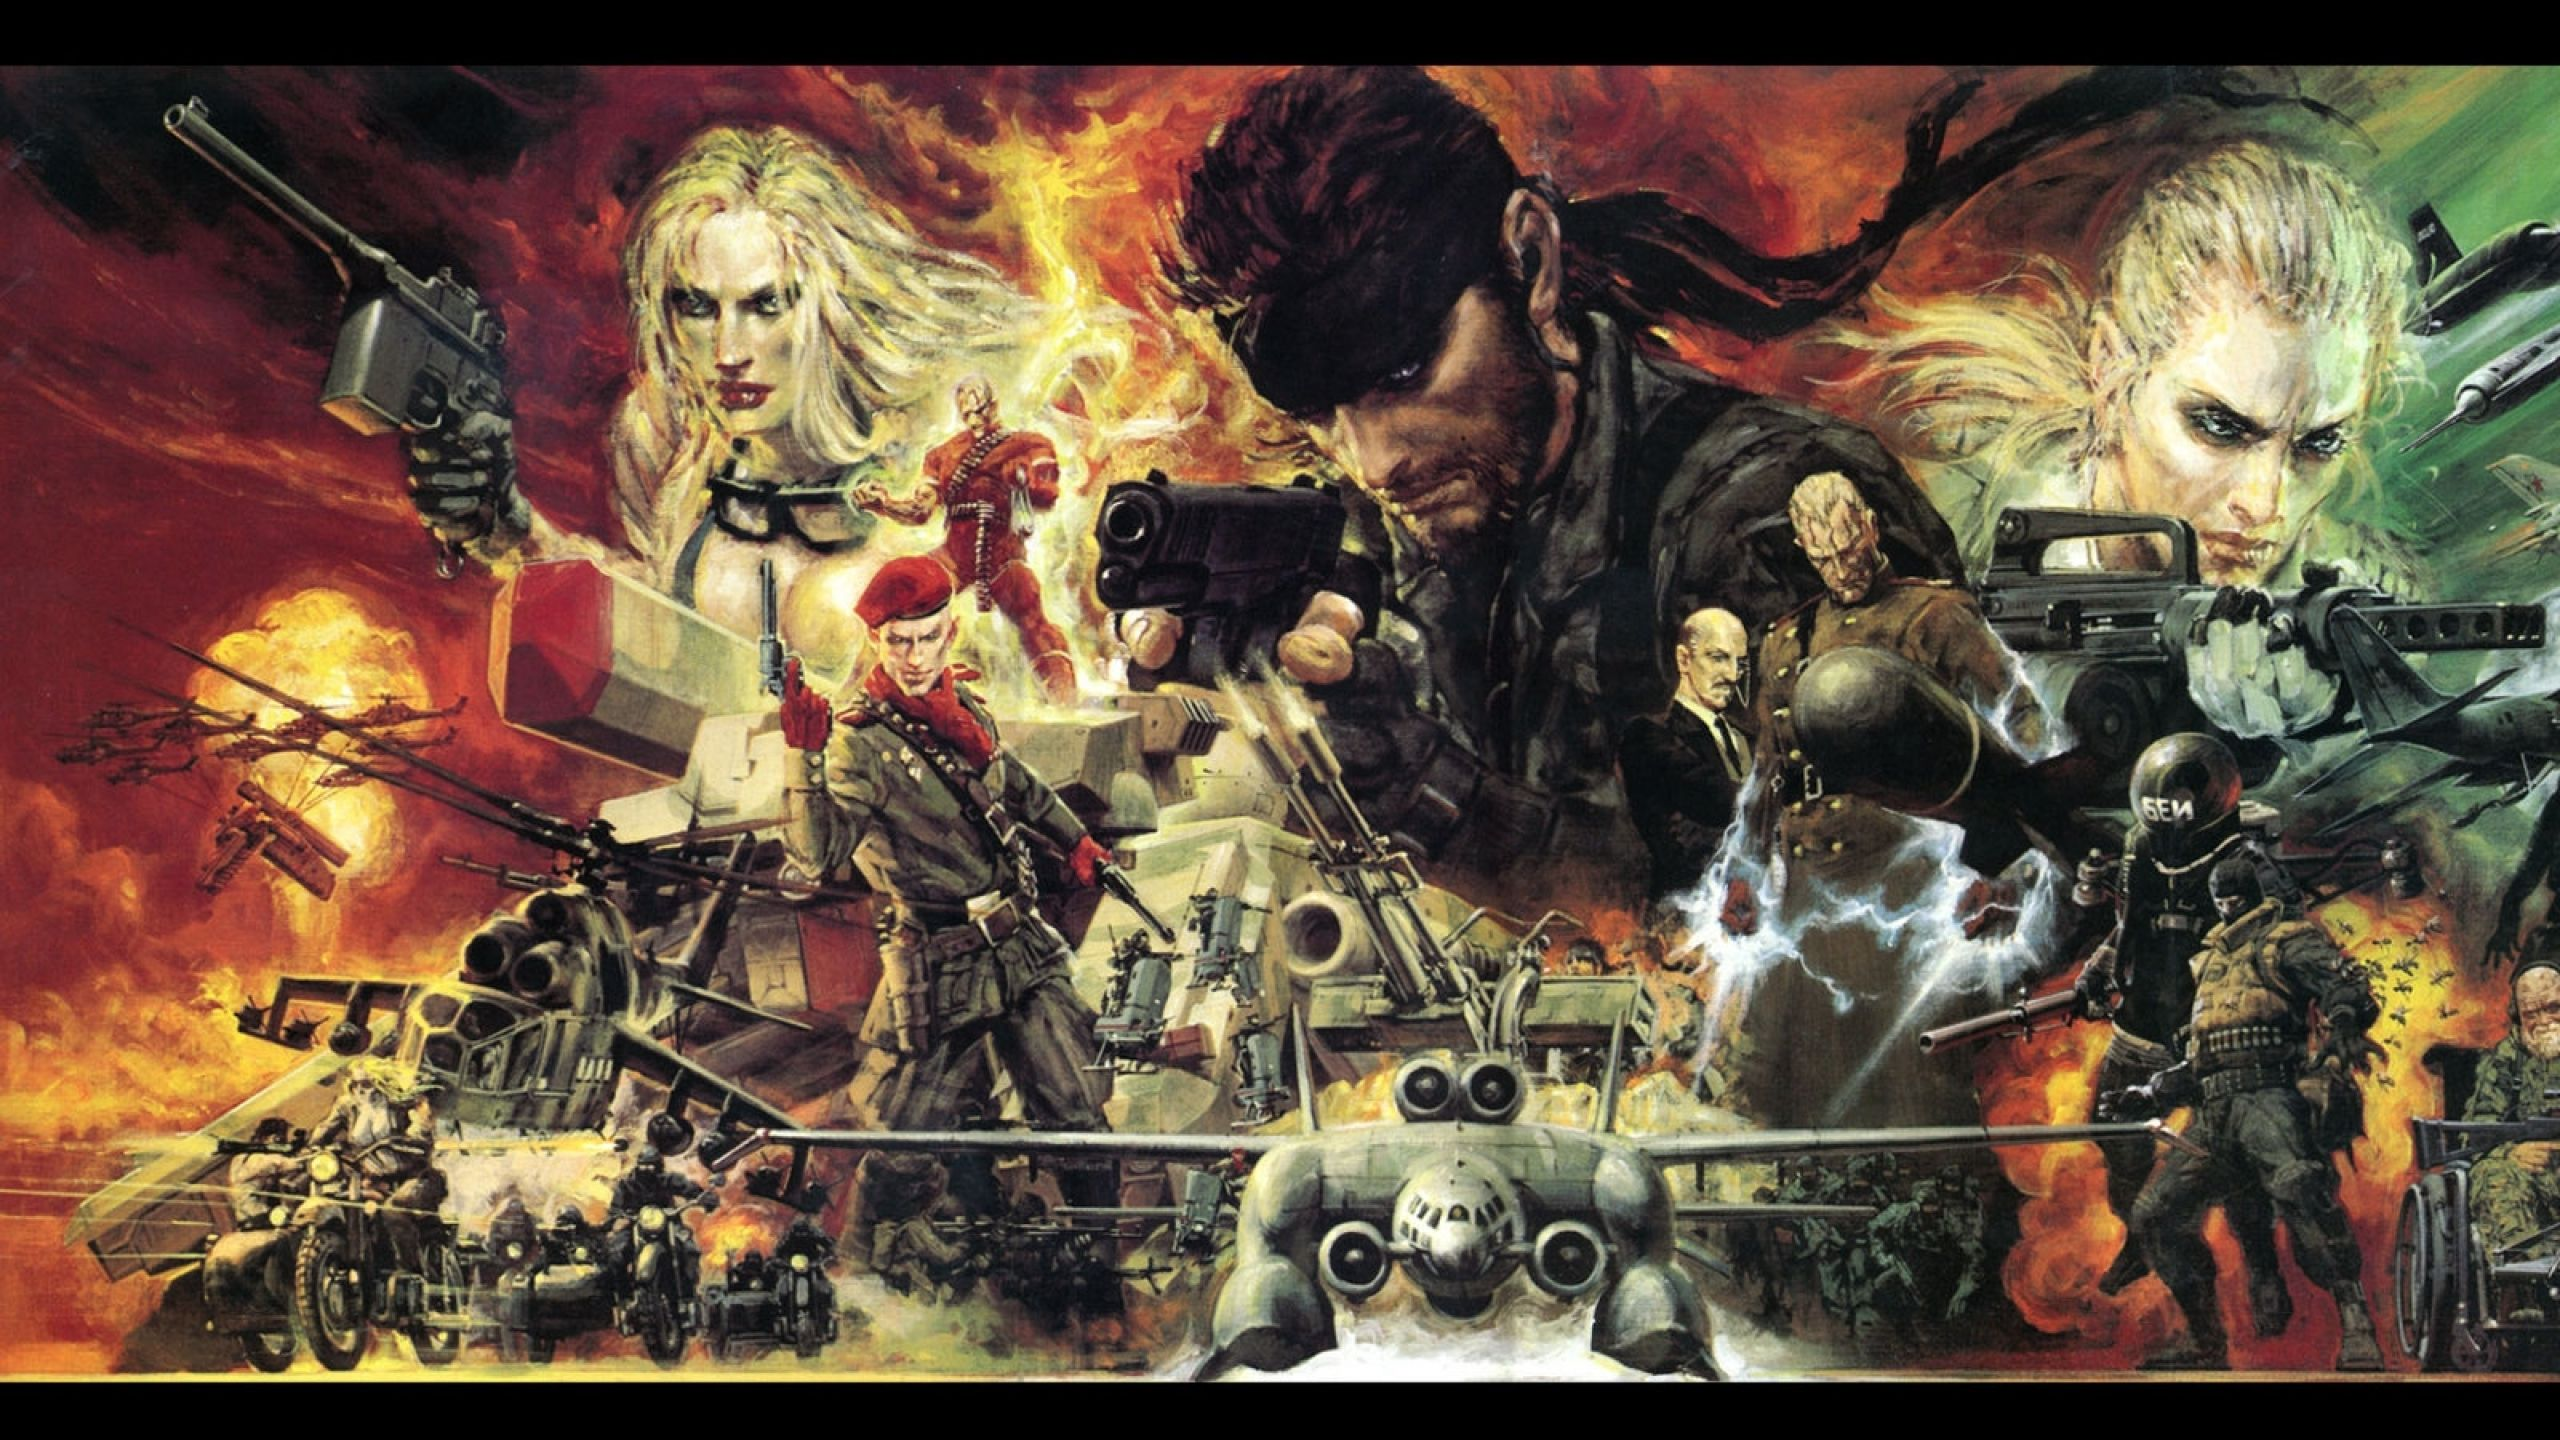 Return Of The Living Dead Wallpaper Google Search Metal Gear